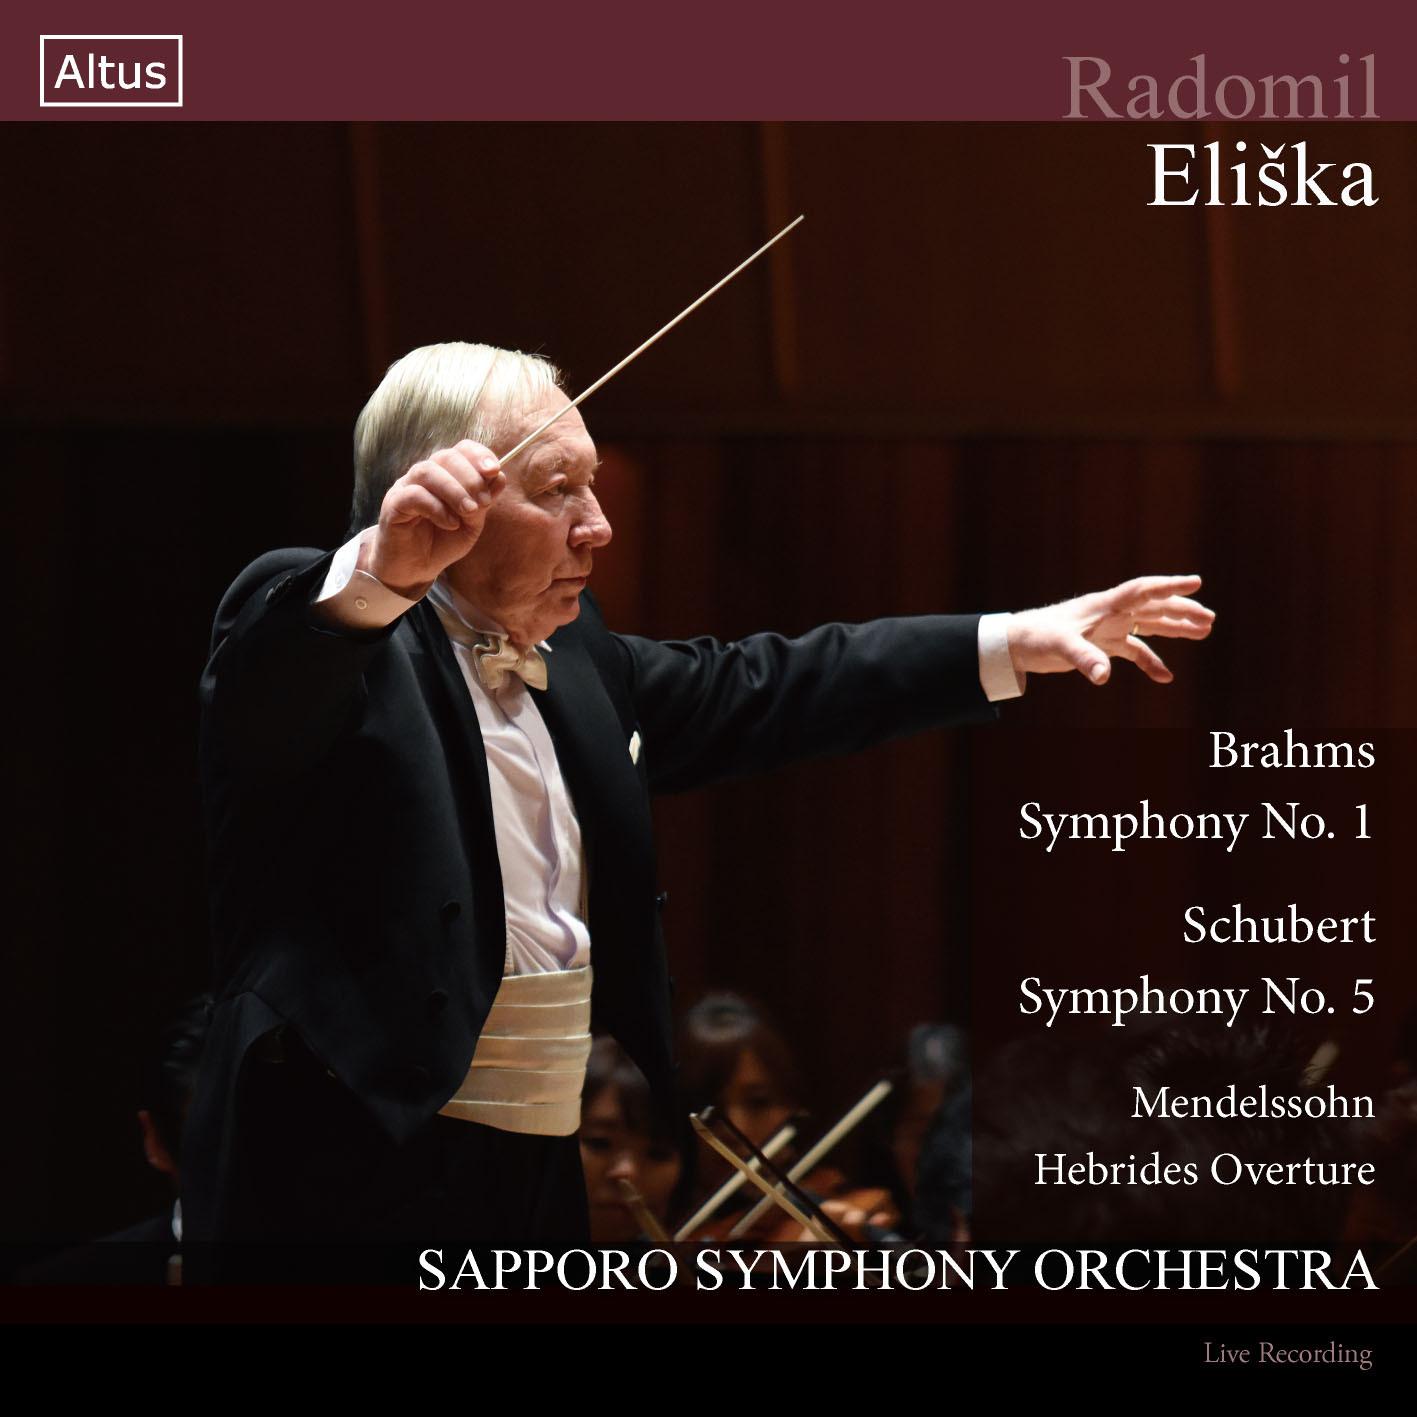 Radomil Eliska Sapporo Symphony Orchestra Brahms Symphony No. 1